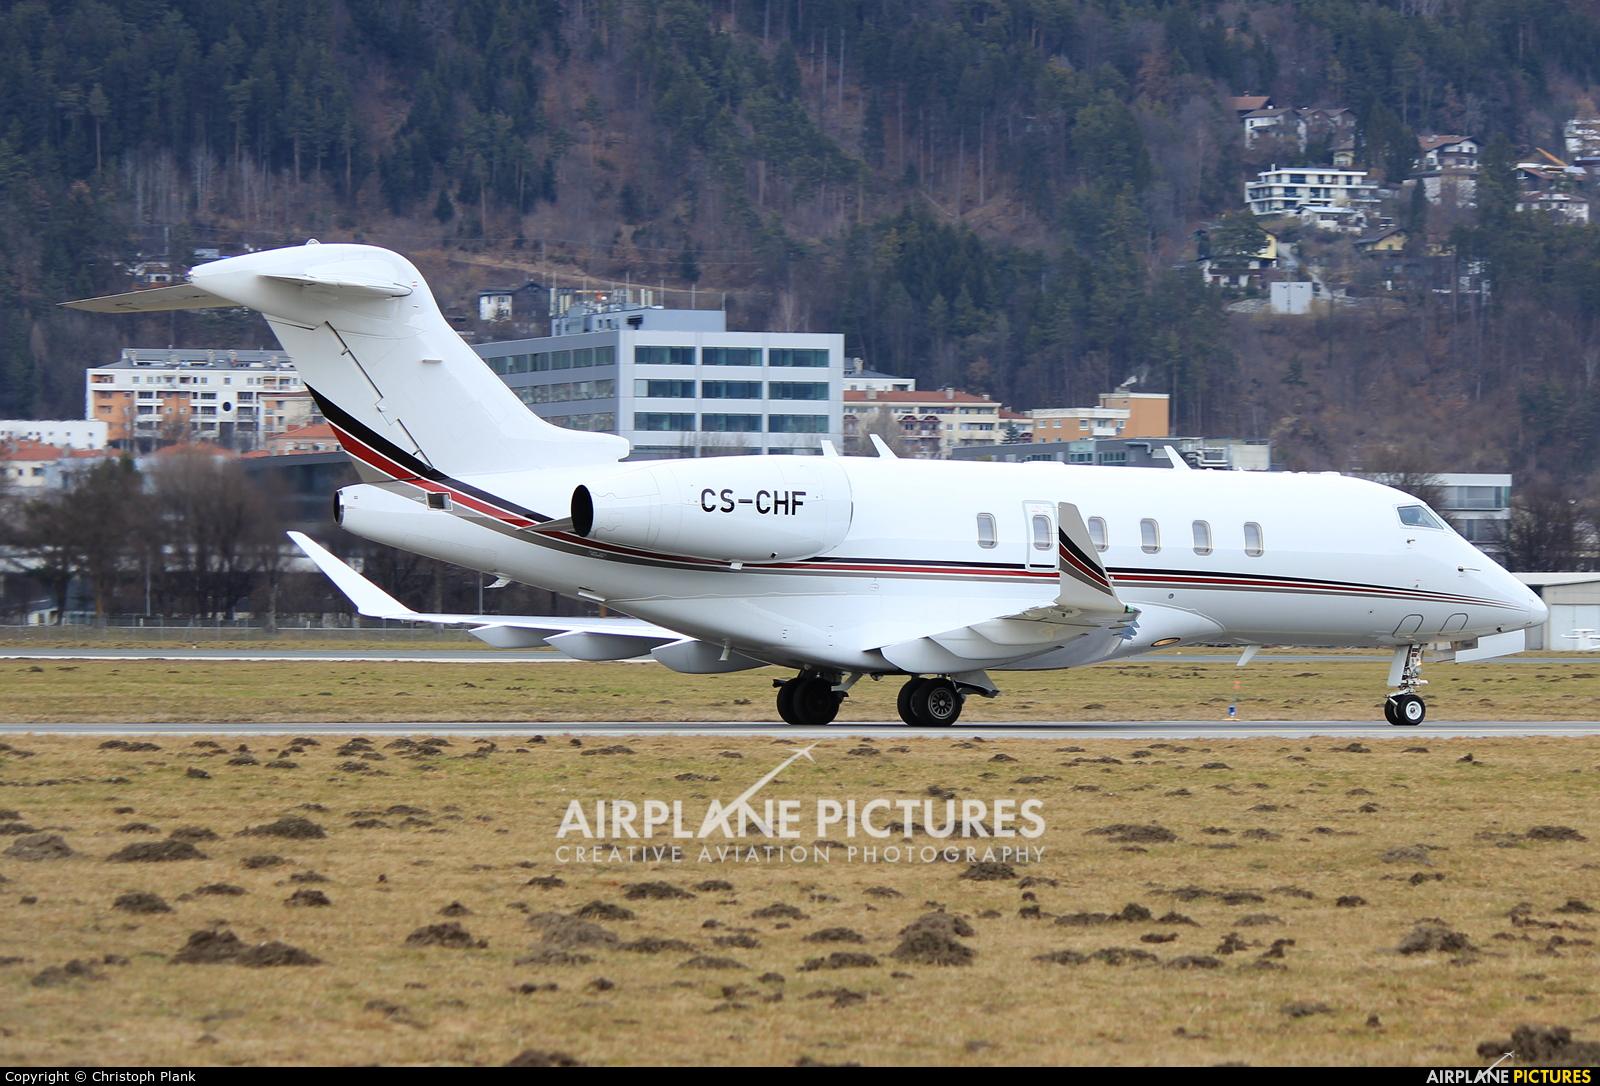 NetJets Europe (Portugal) CS-CHF aircraft at Innsbruck